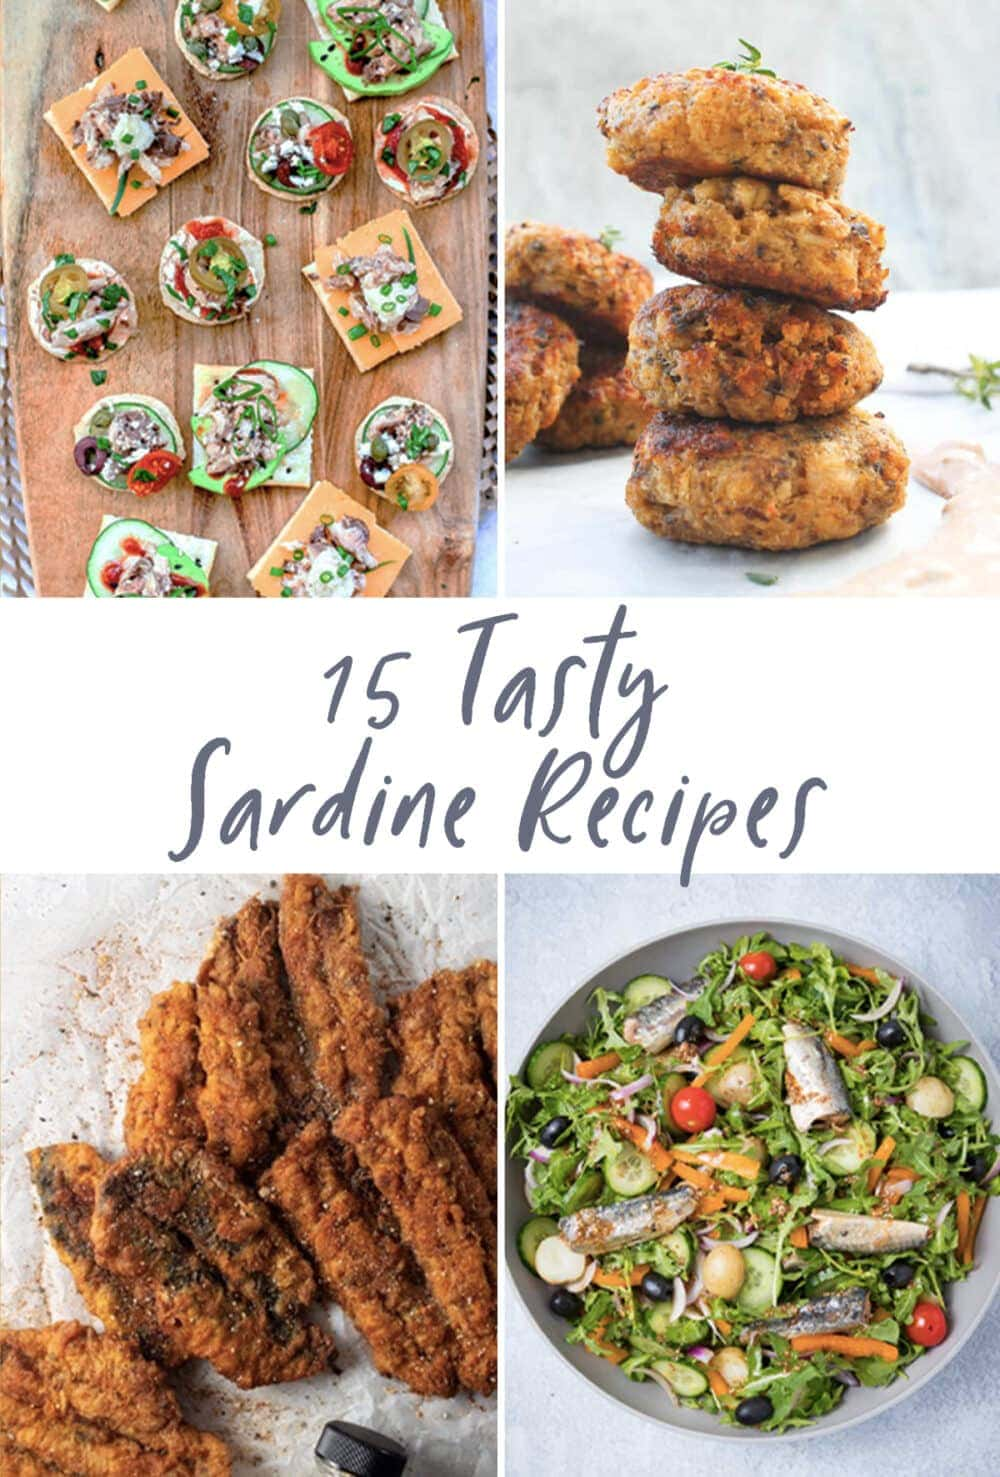 Graphic for 15 tasty sardine recipes post